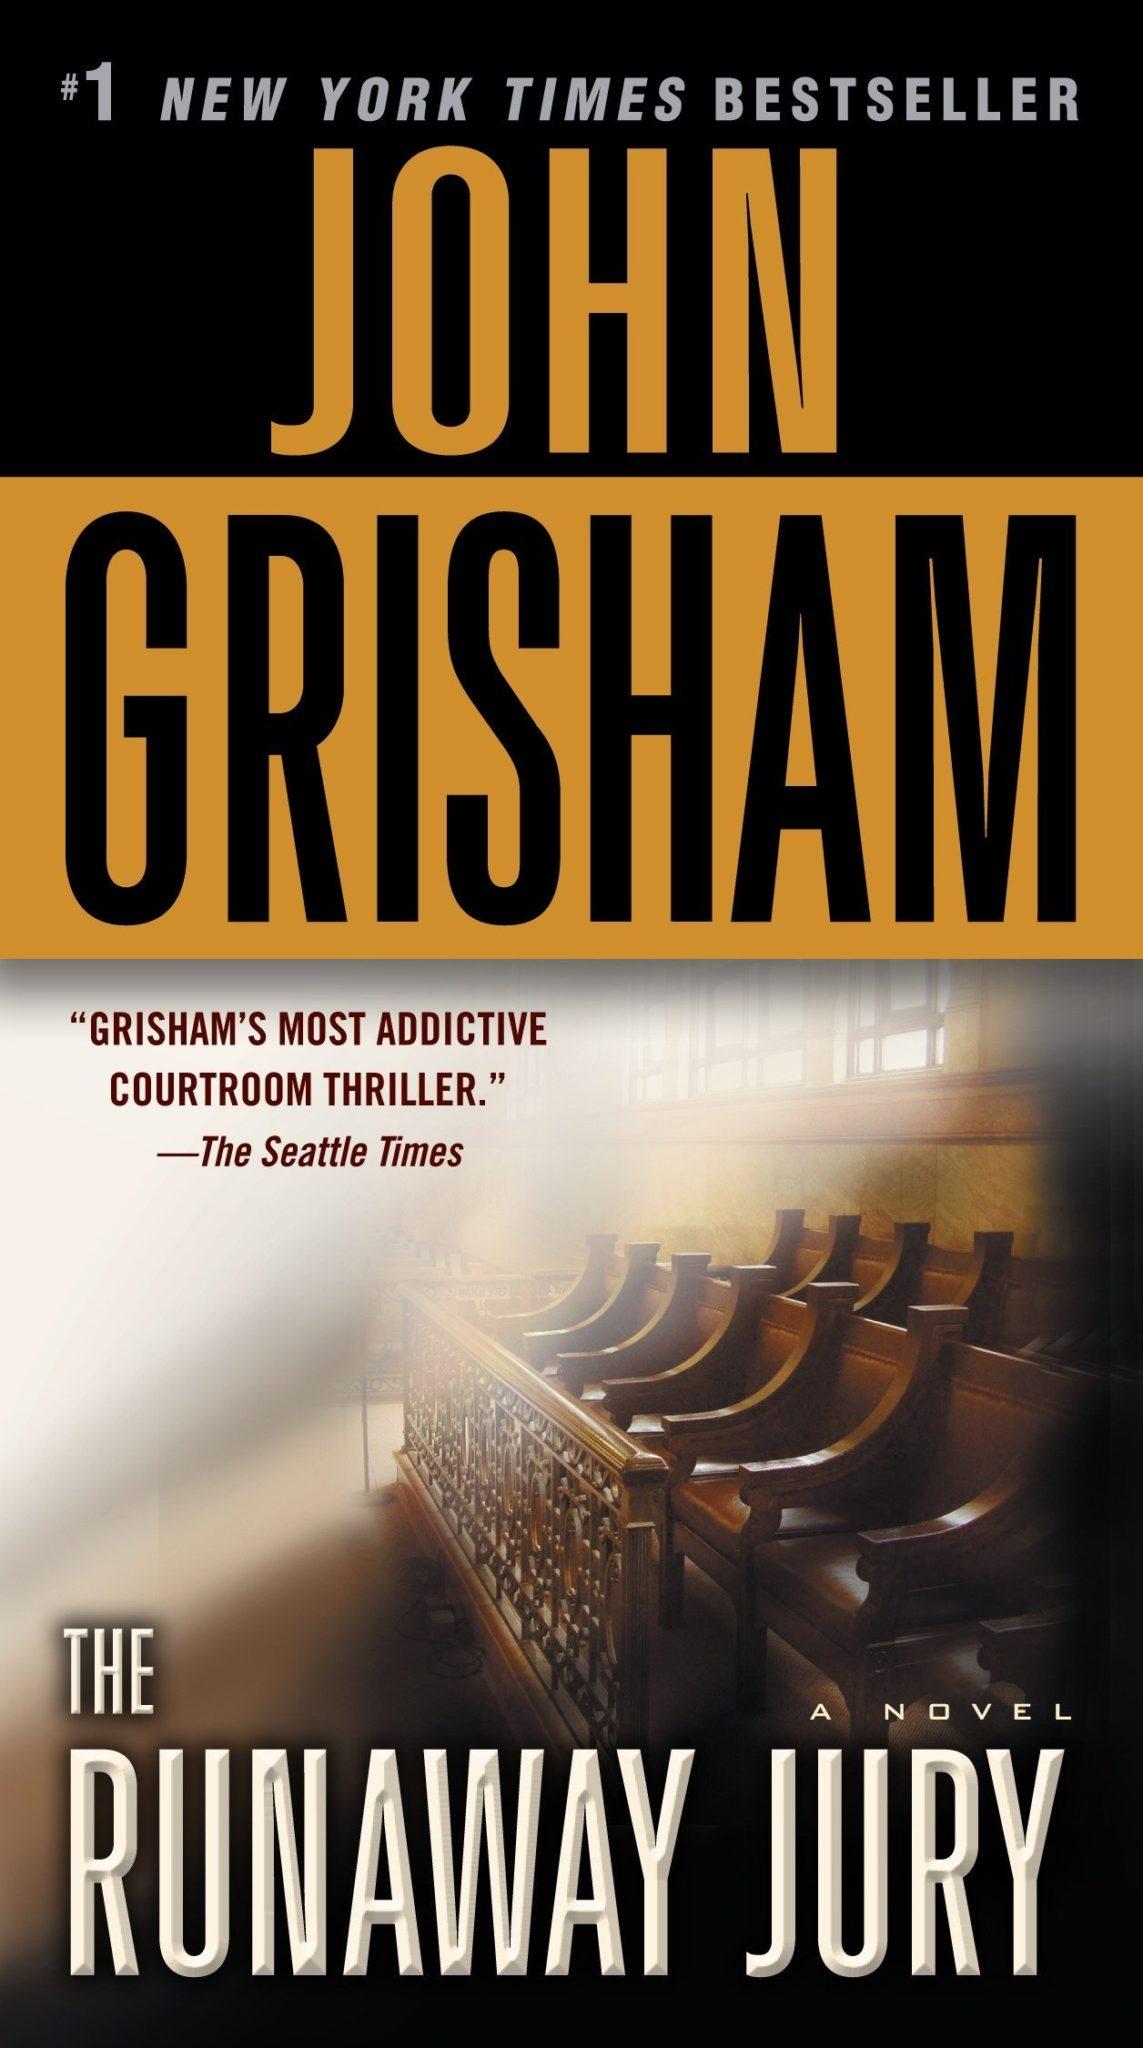 John Grisham books 9